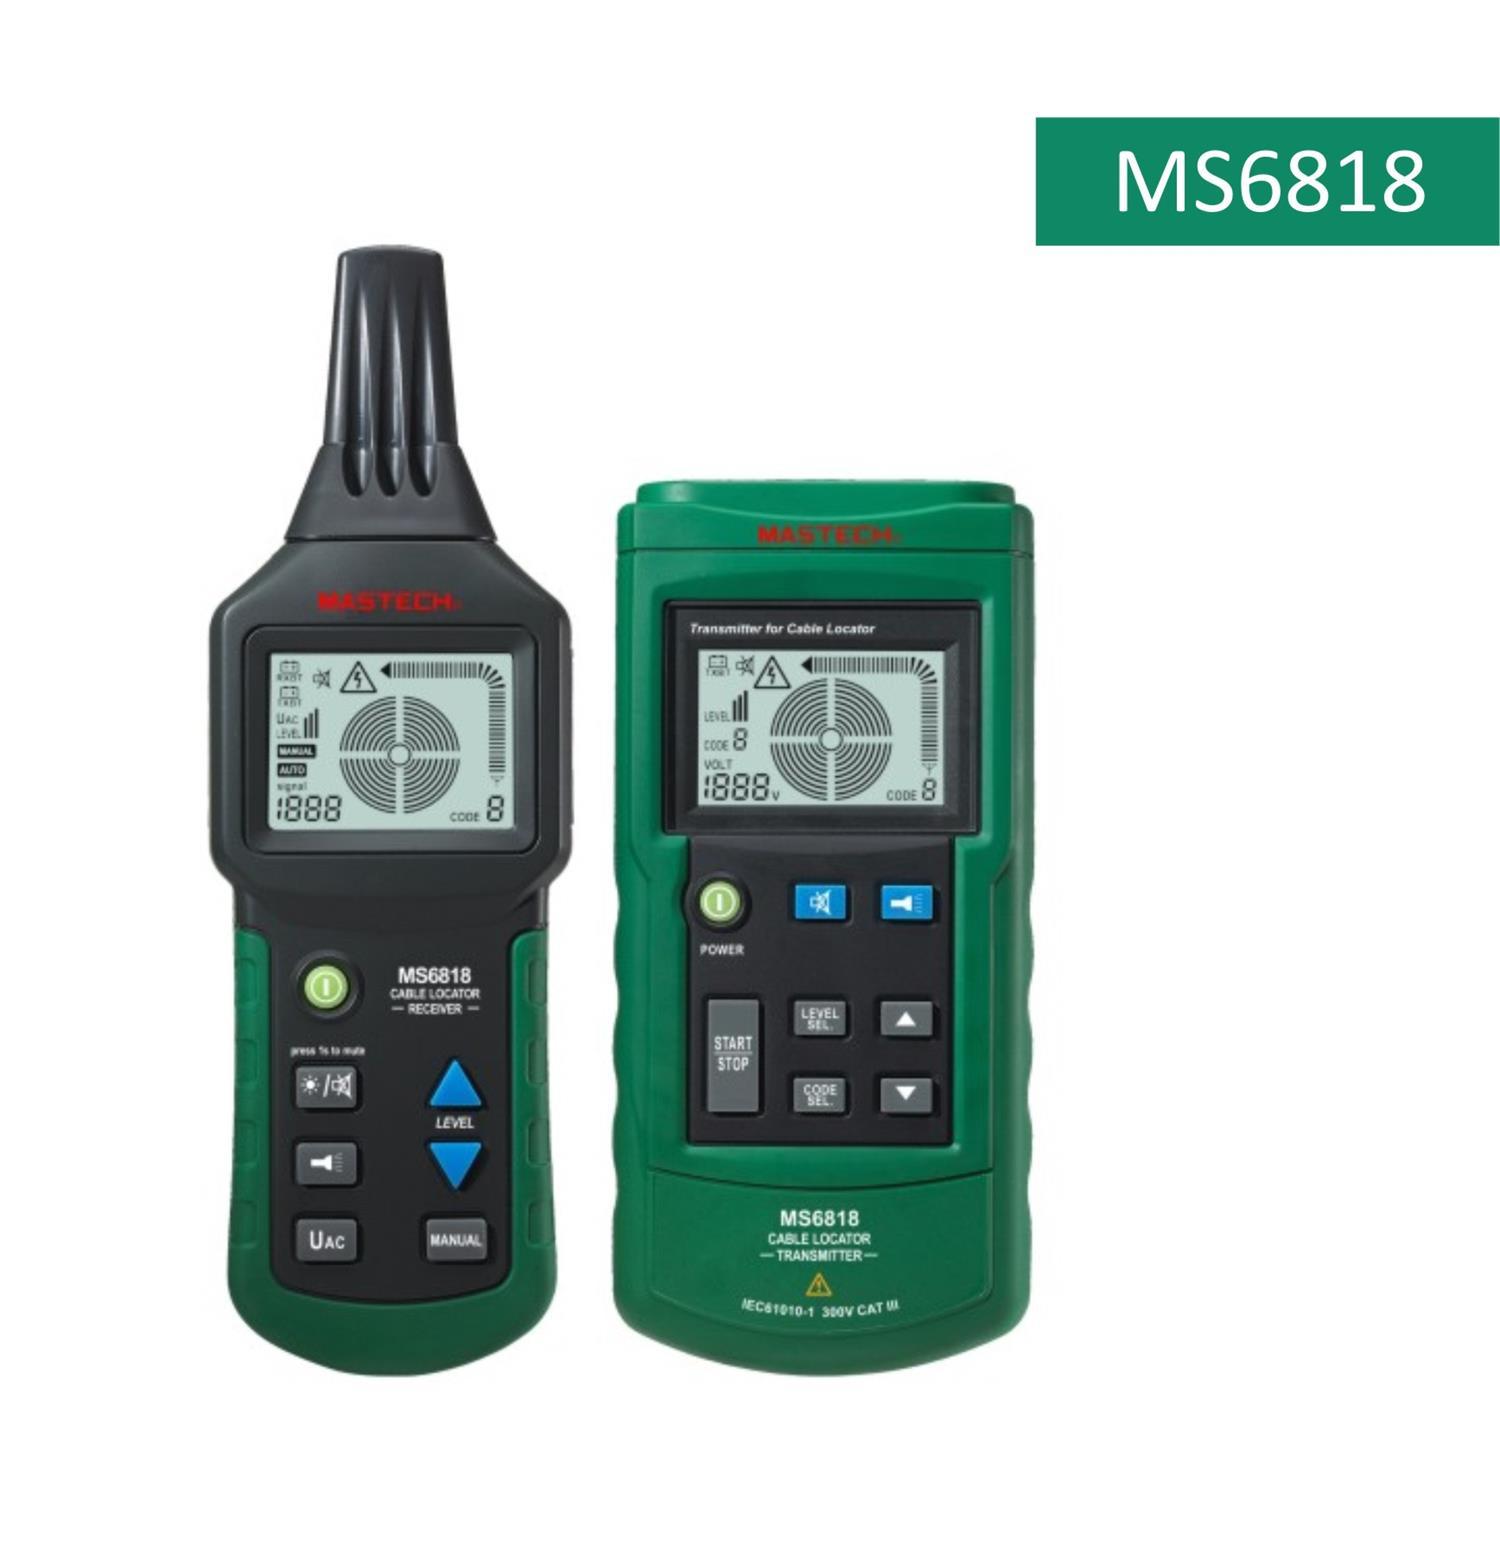 MS6818